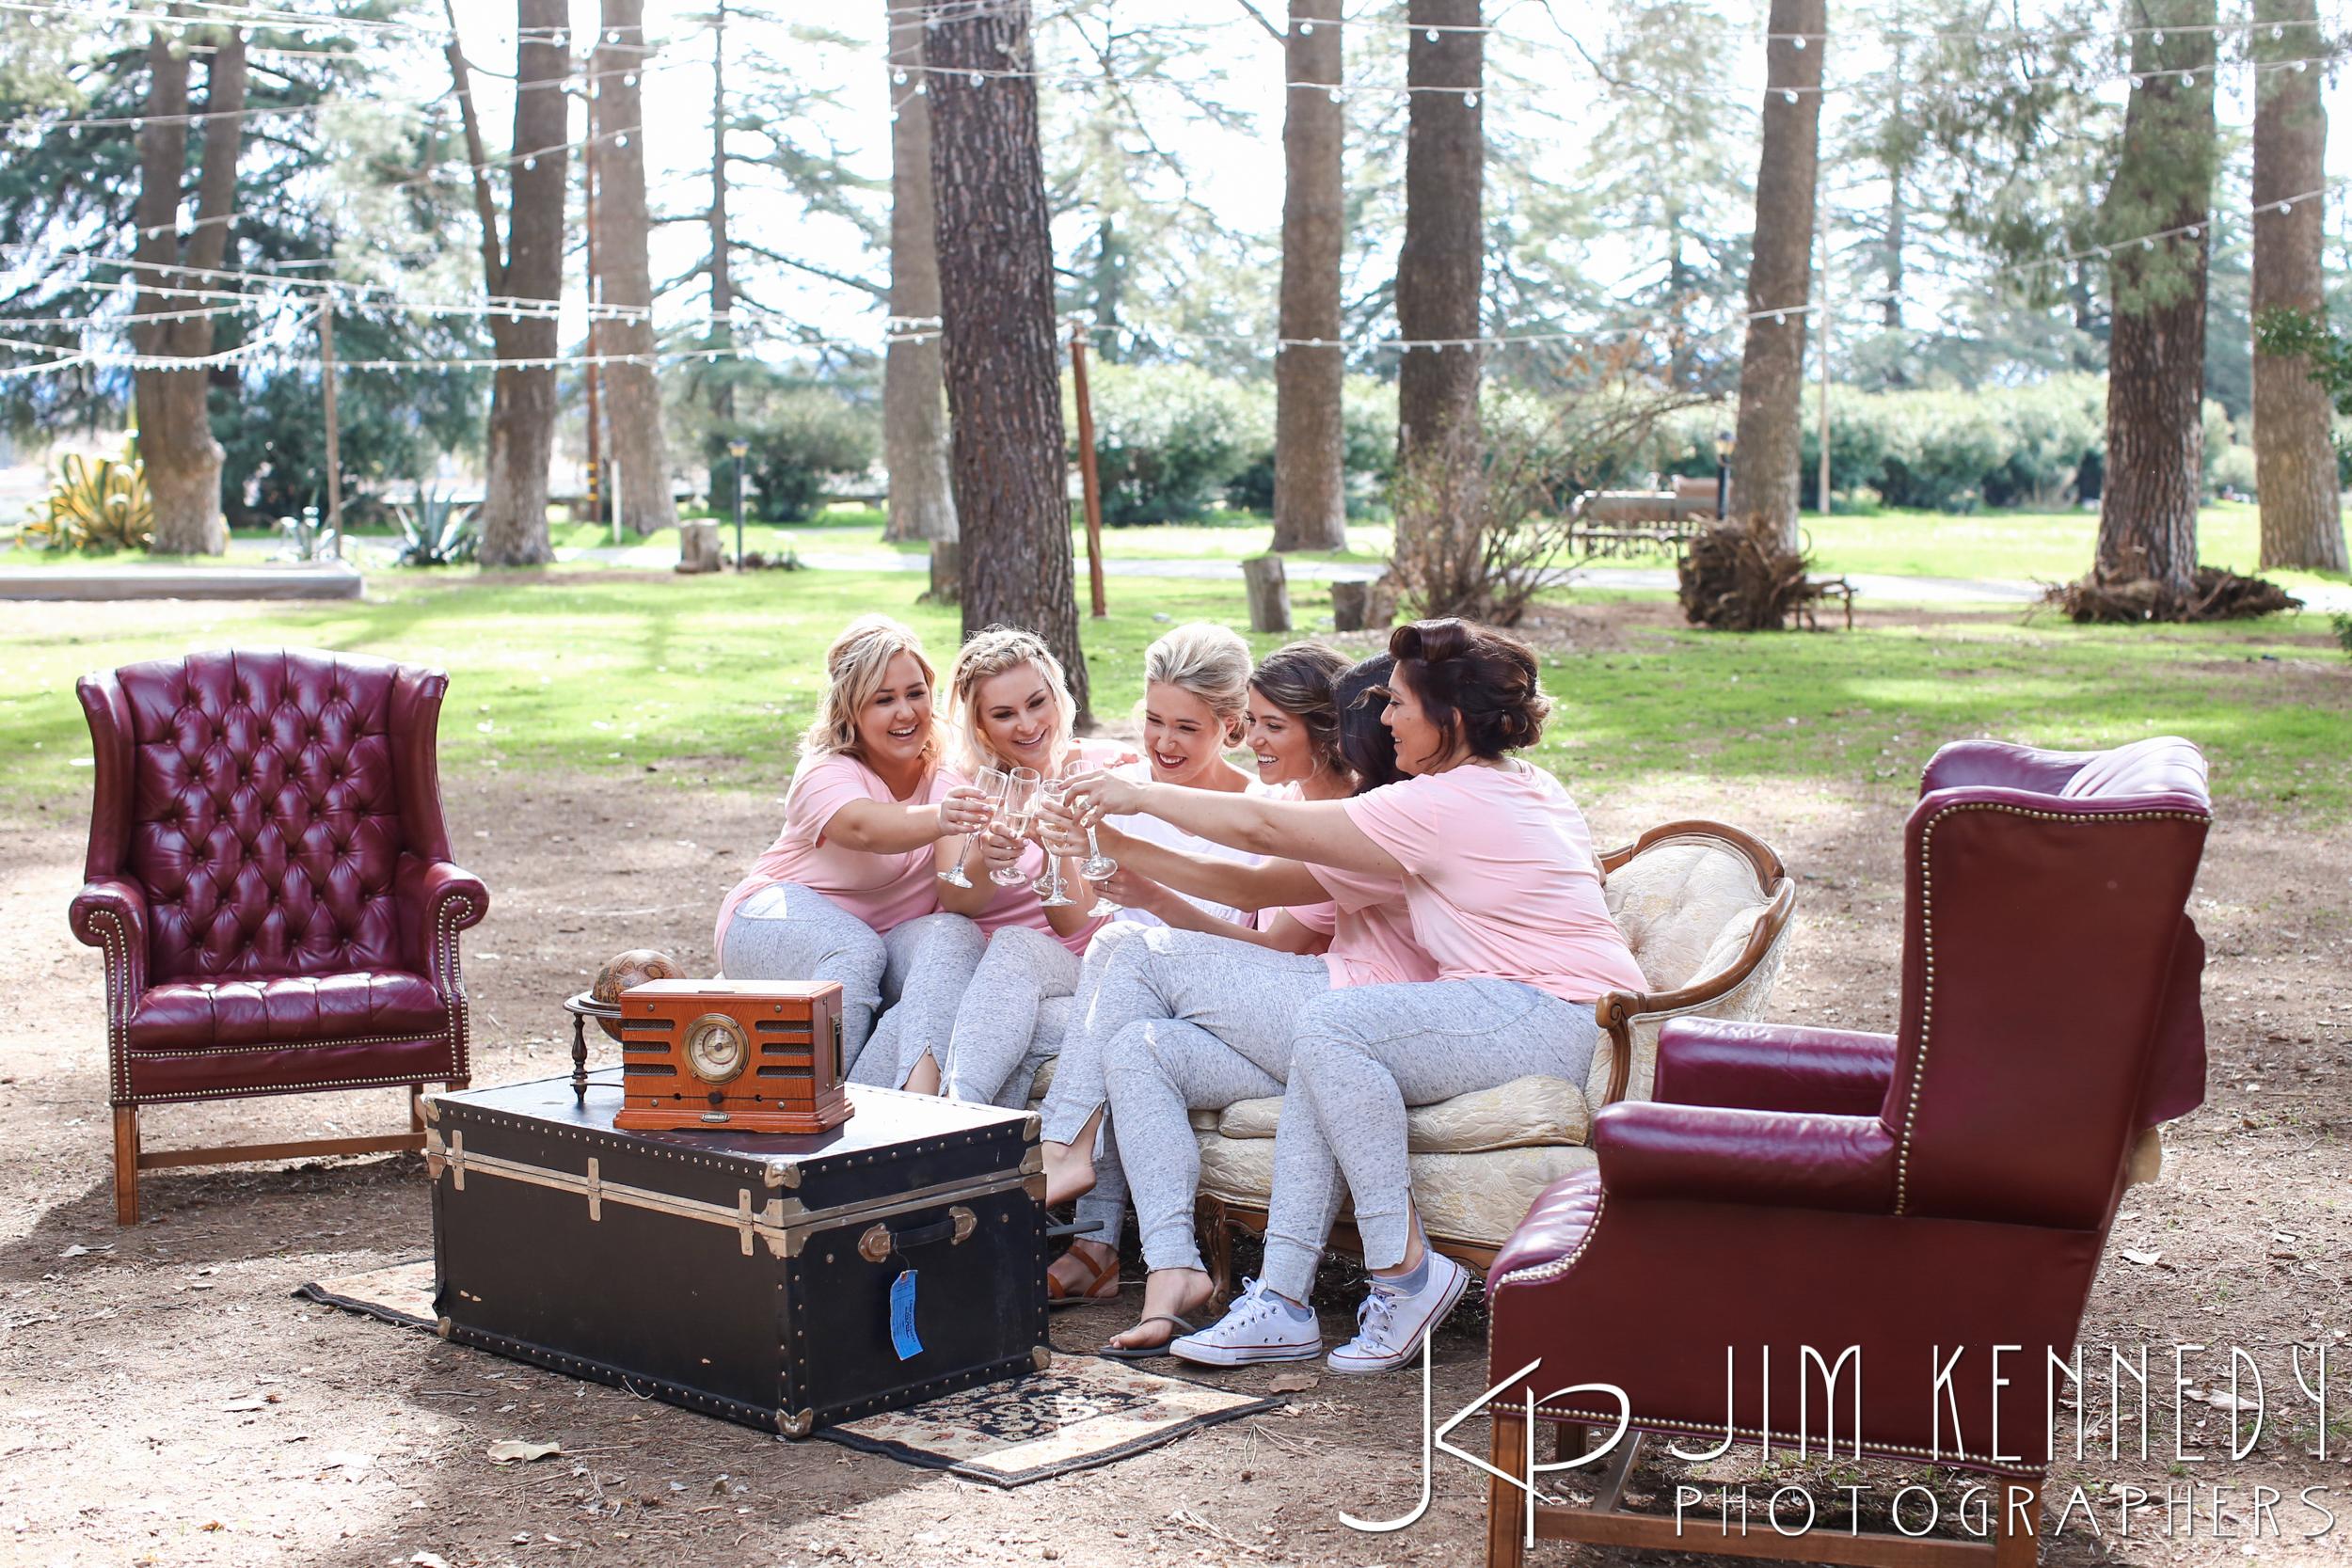 jim_kennedy_photographers_highland_springs_wedding_caitlyn_0016.jpg